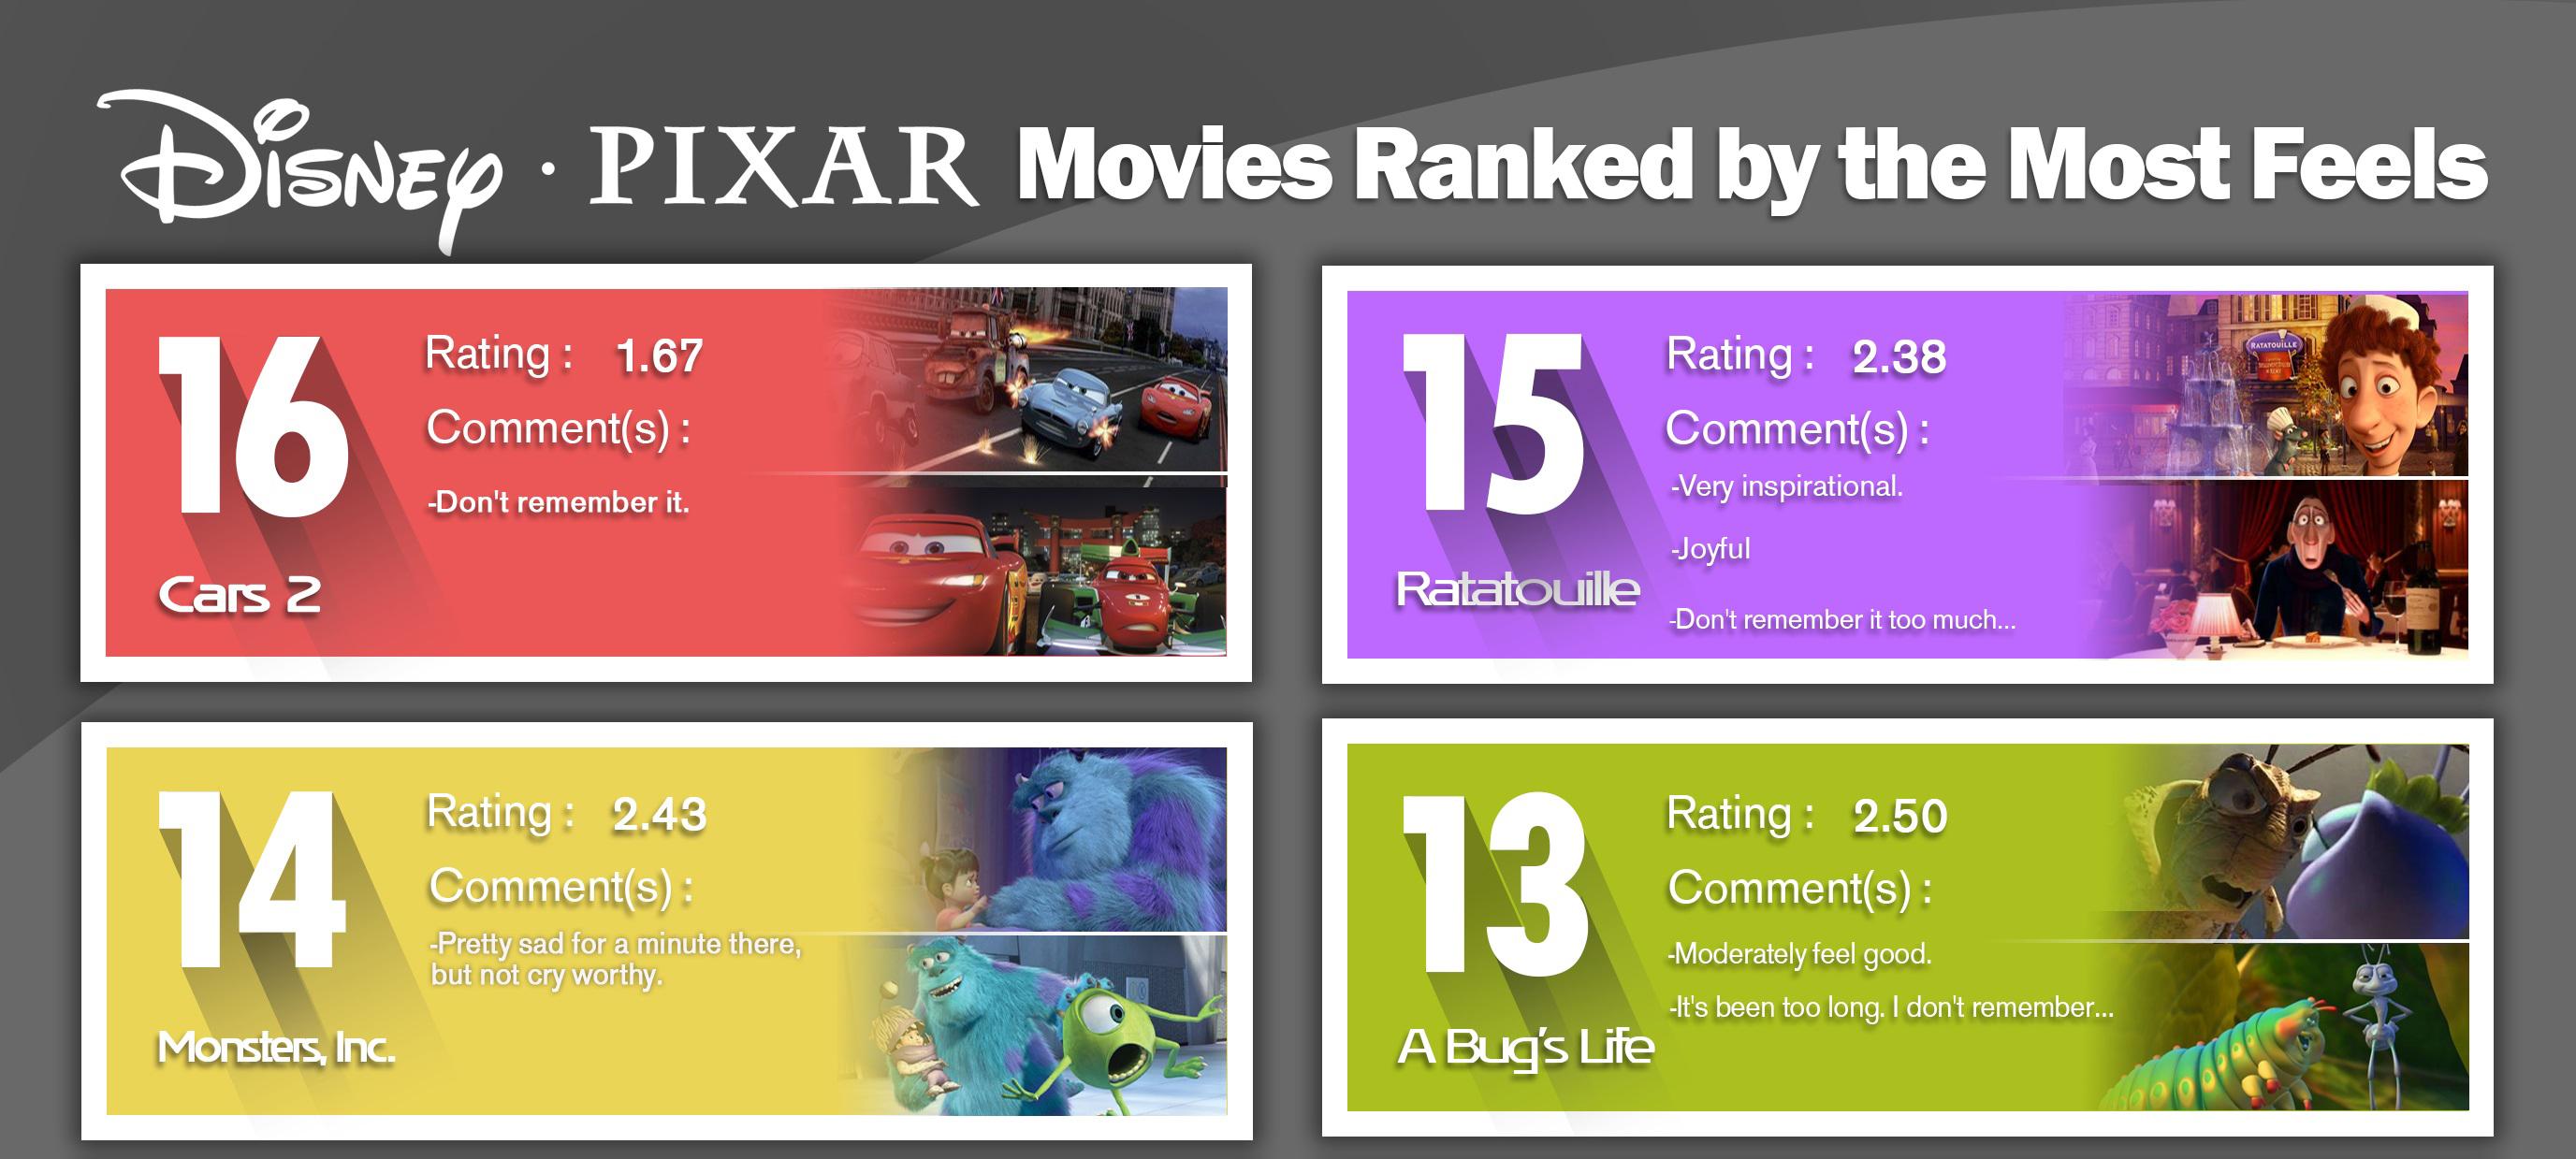 Disney-Pixar Films Ranked On Most Feels Is Very Important